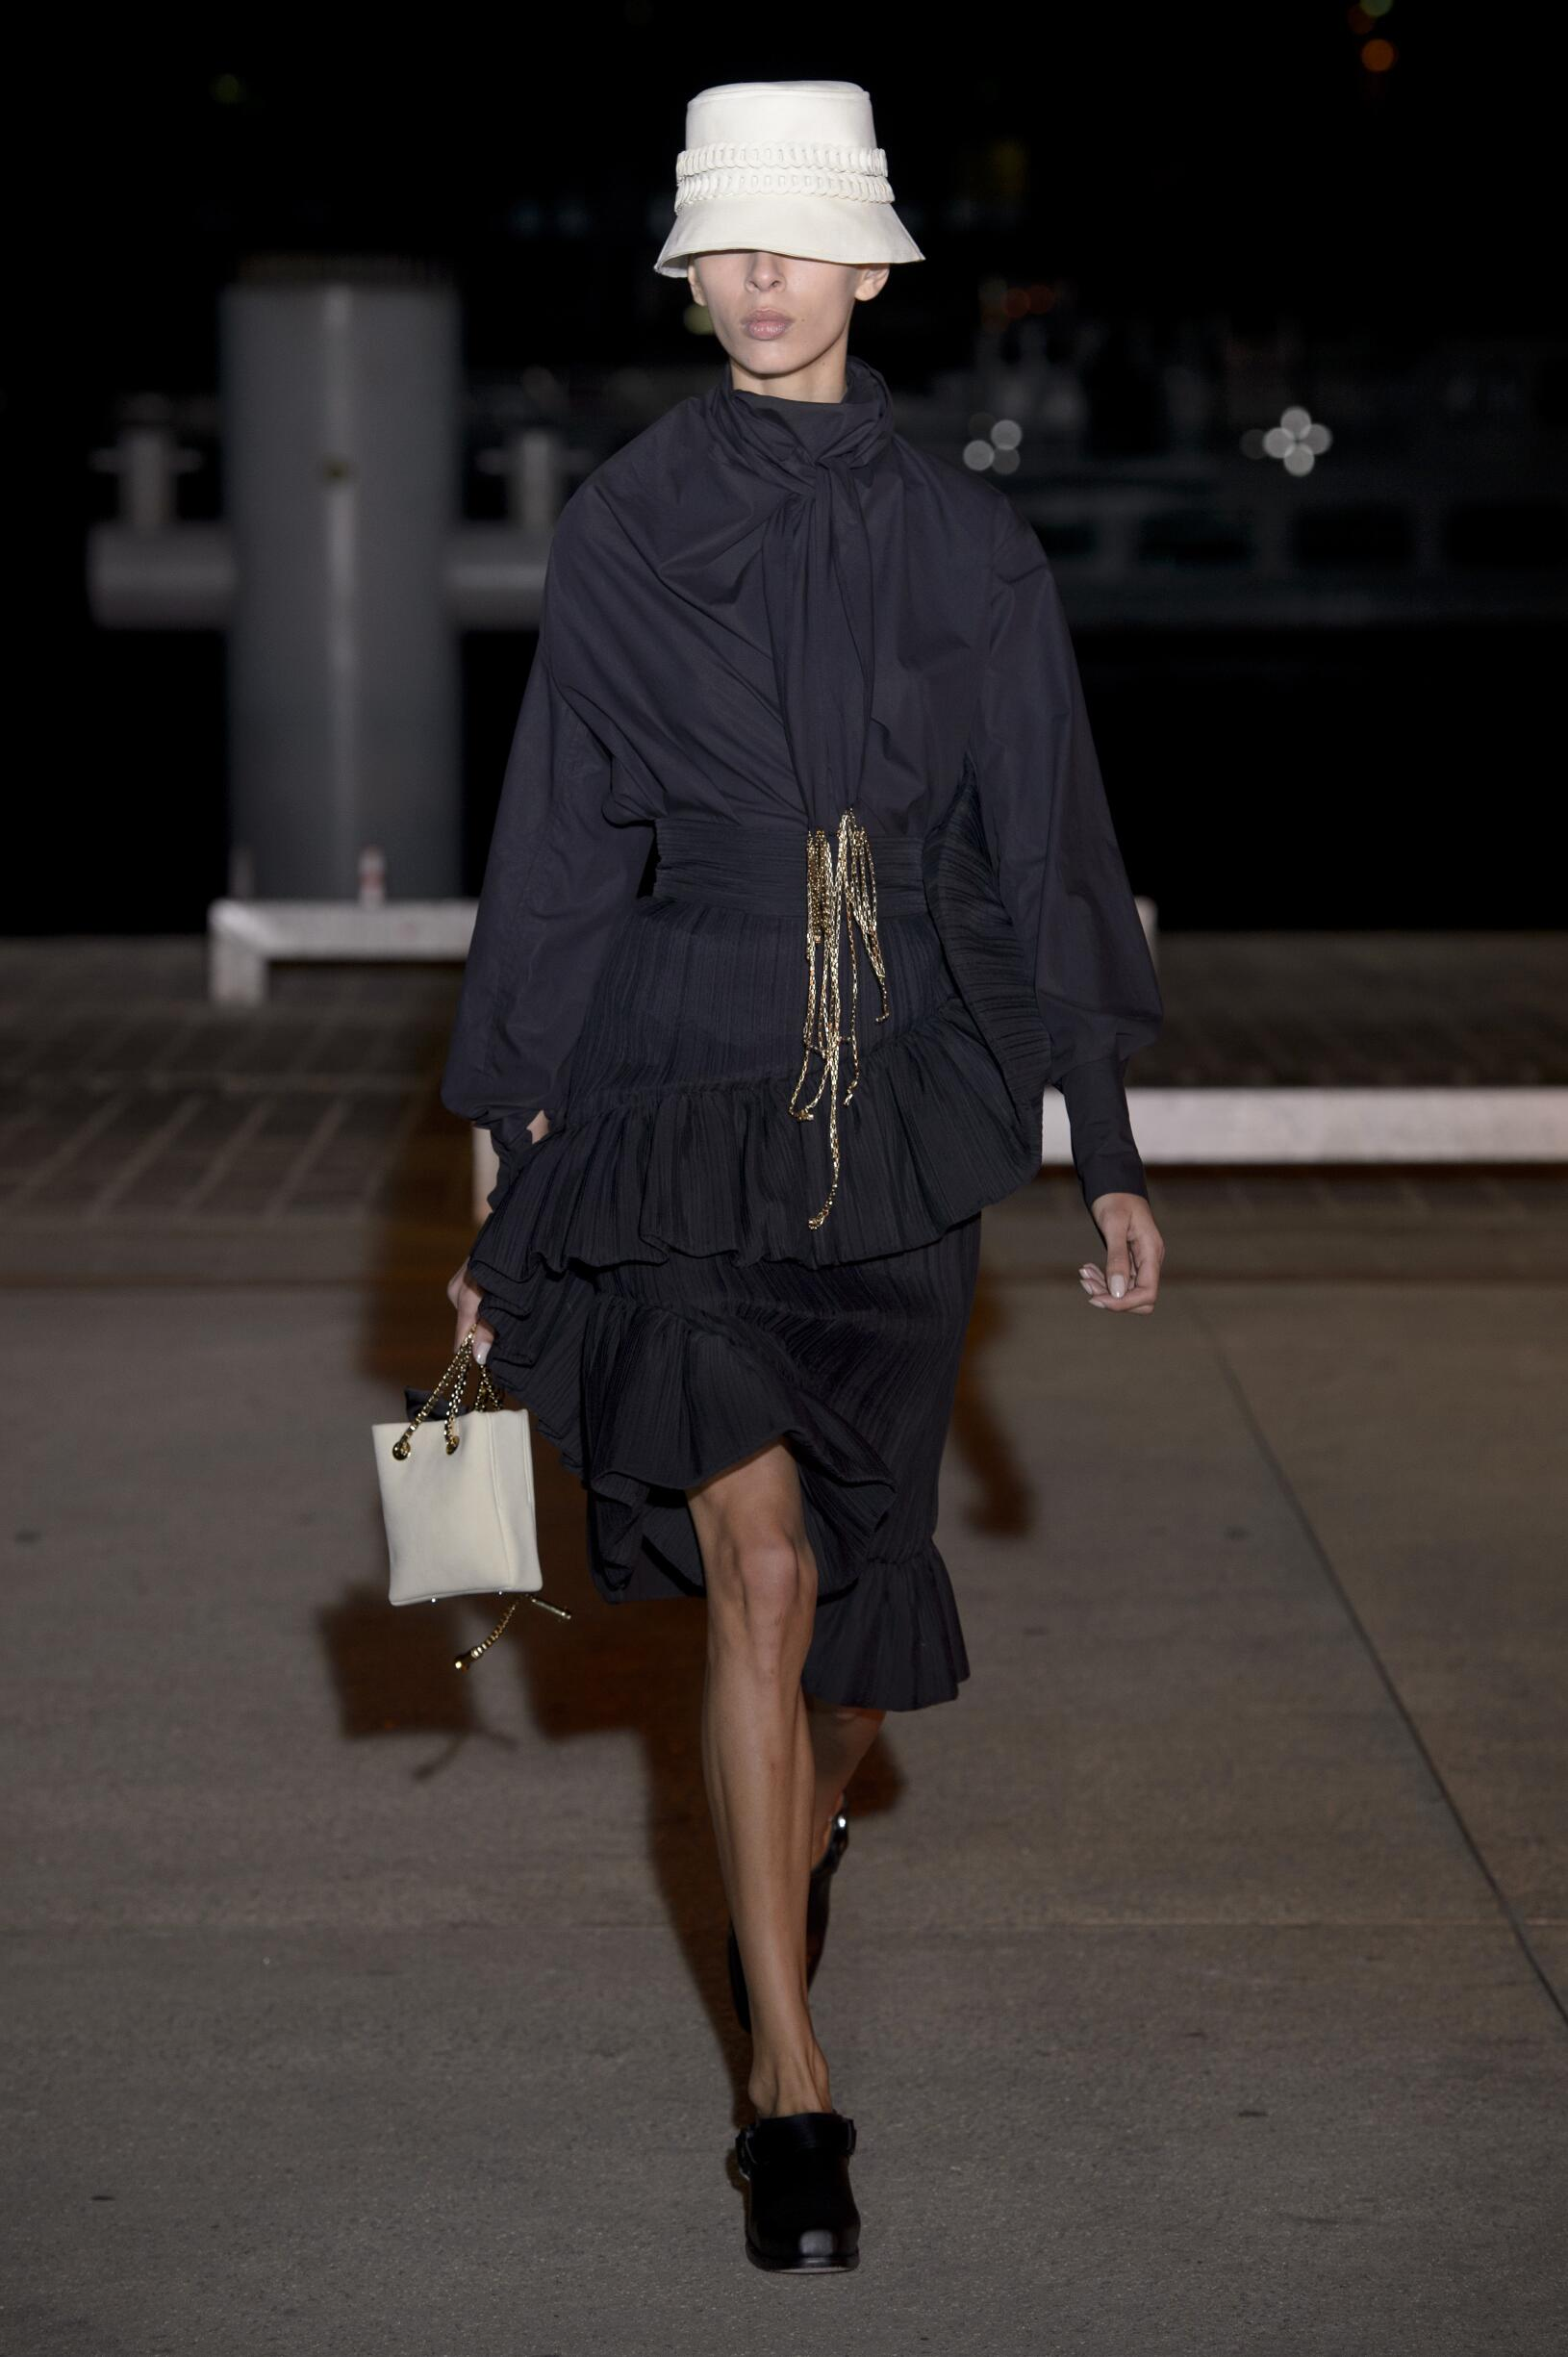 Wanda Nylon Catwalk